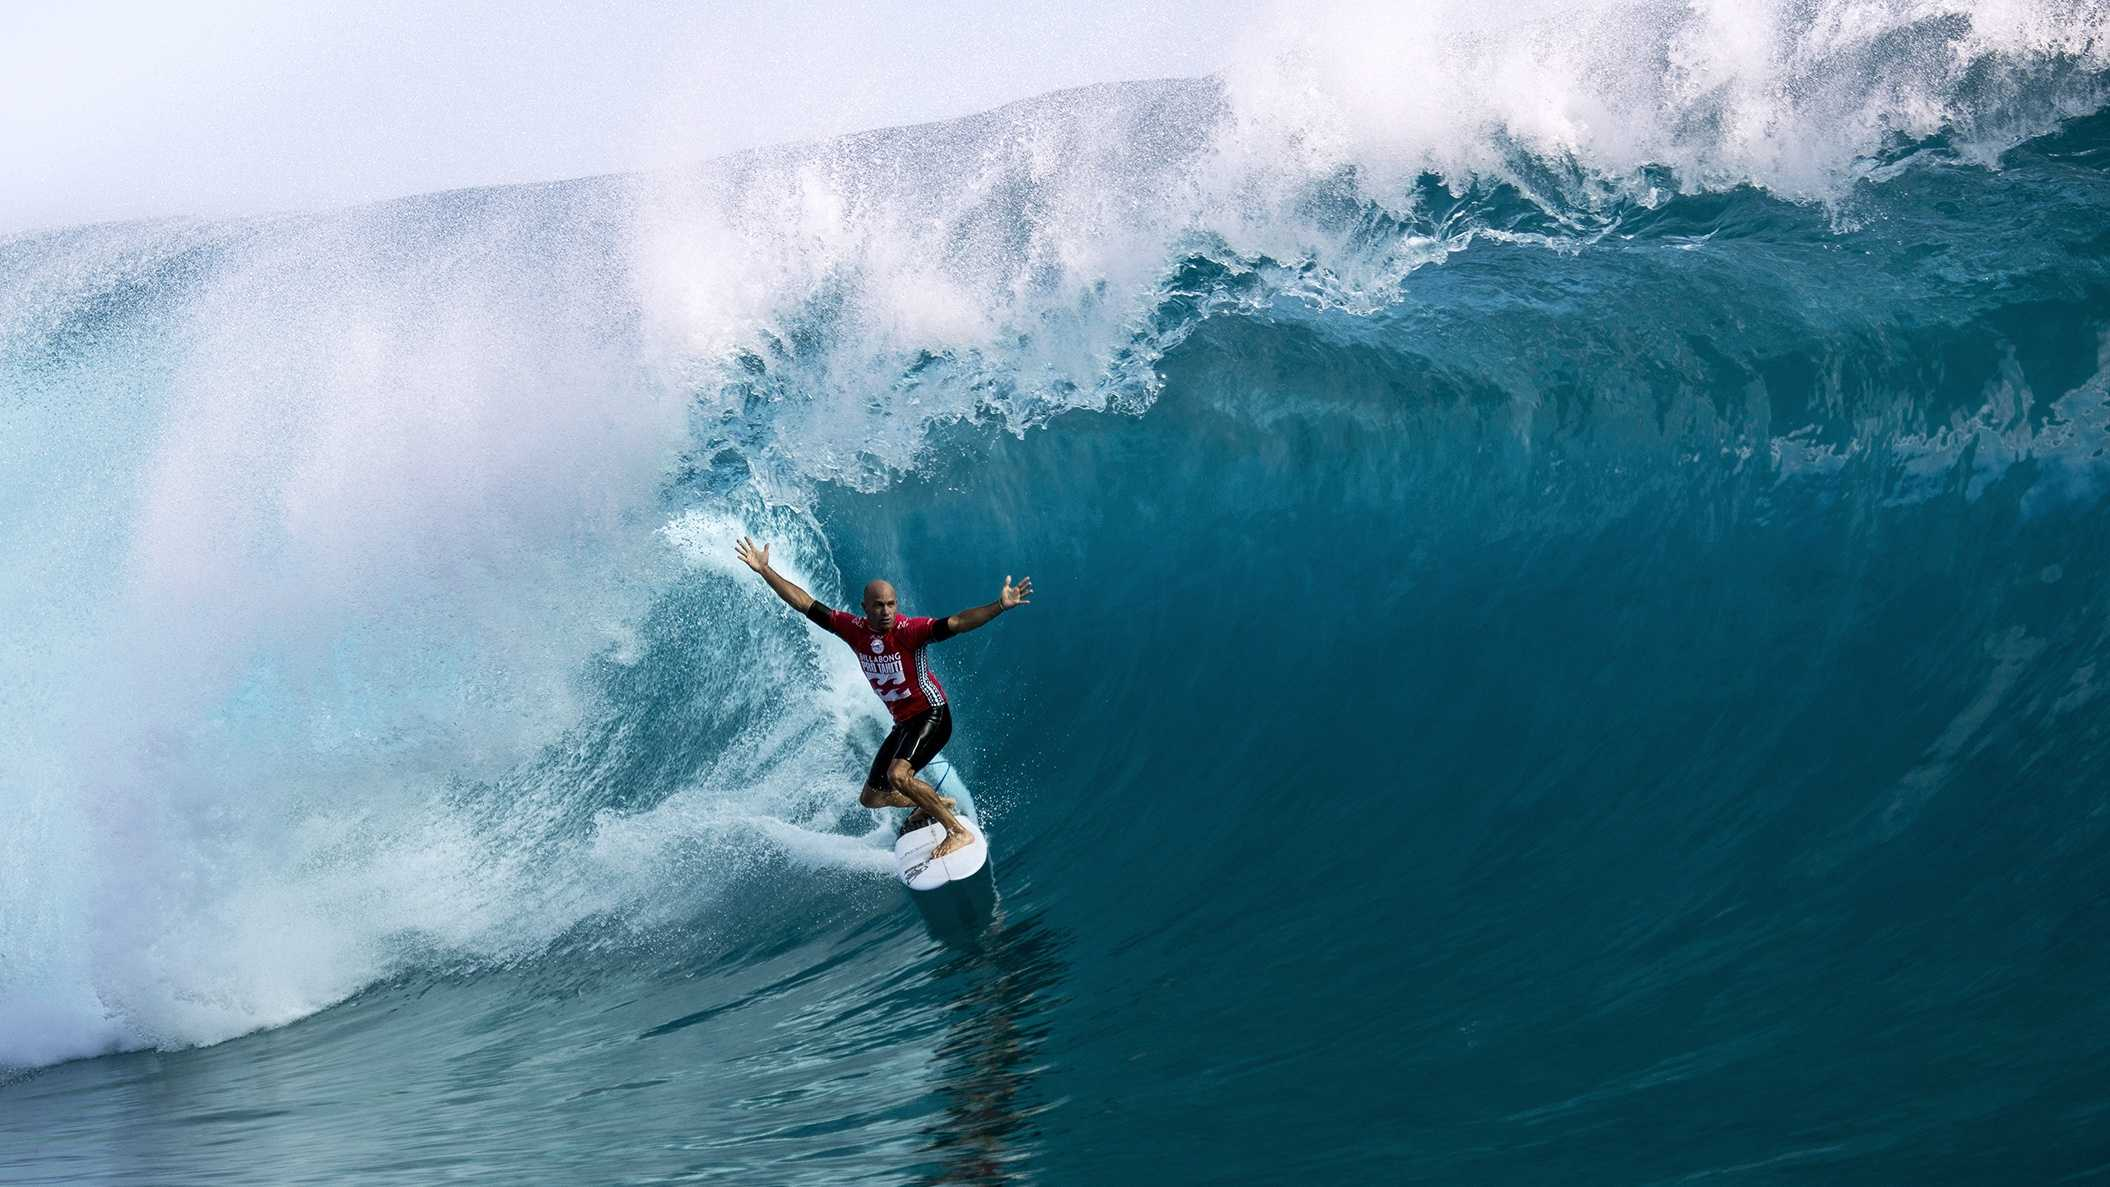 Kelly Slater - World champion surfer